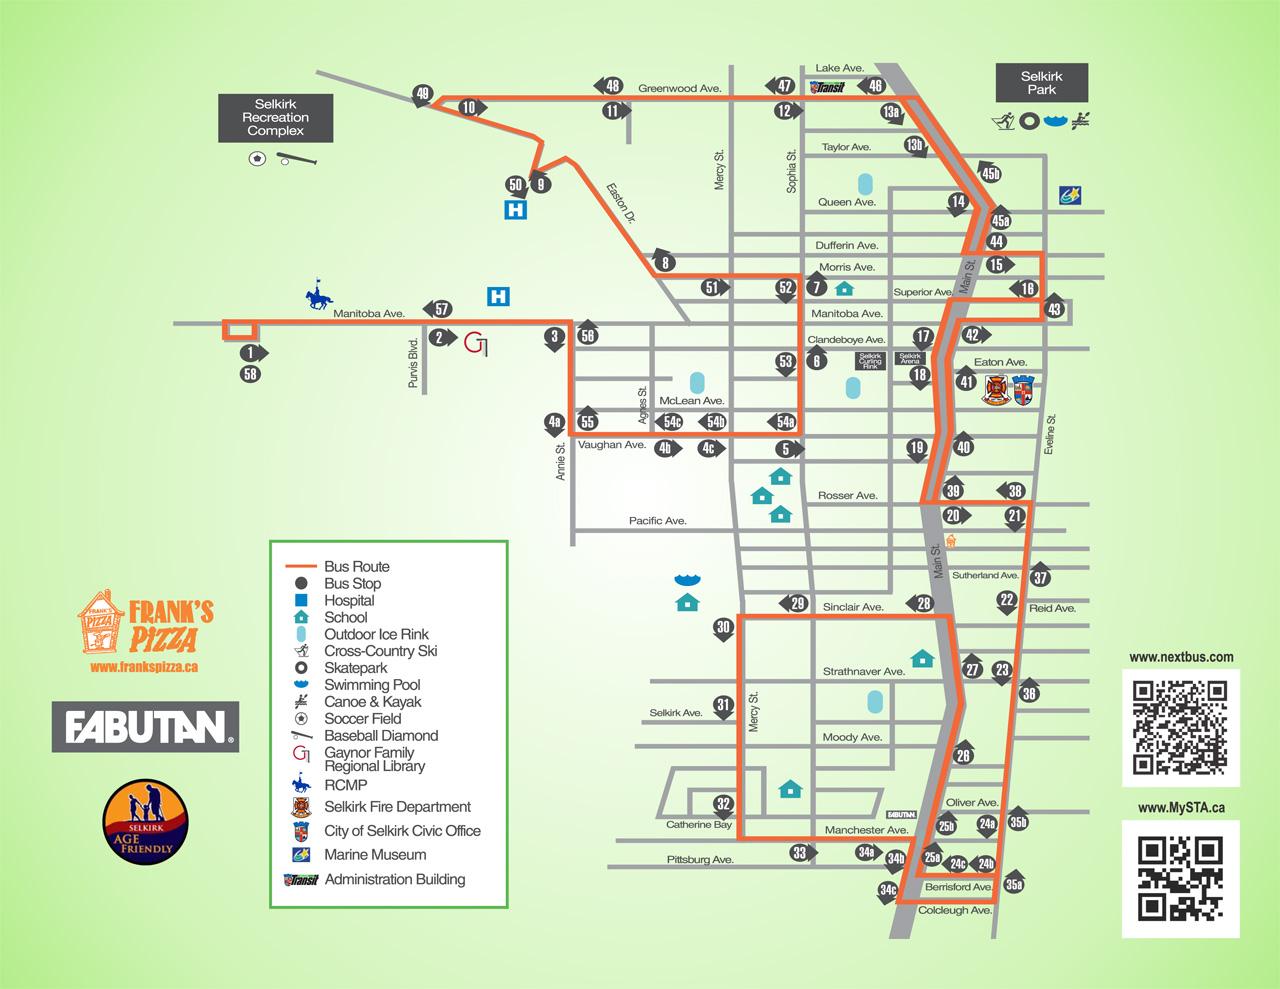 mysta   selkirk transit schedule & map - mysta.ca